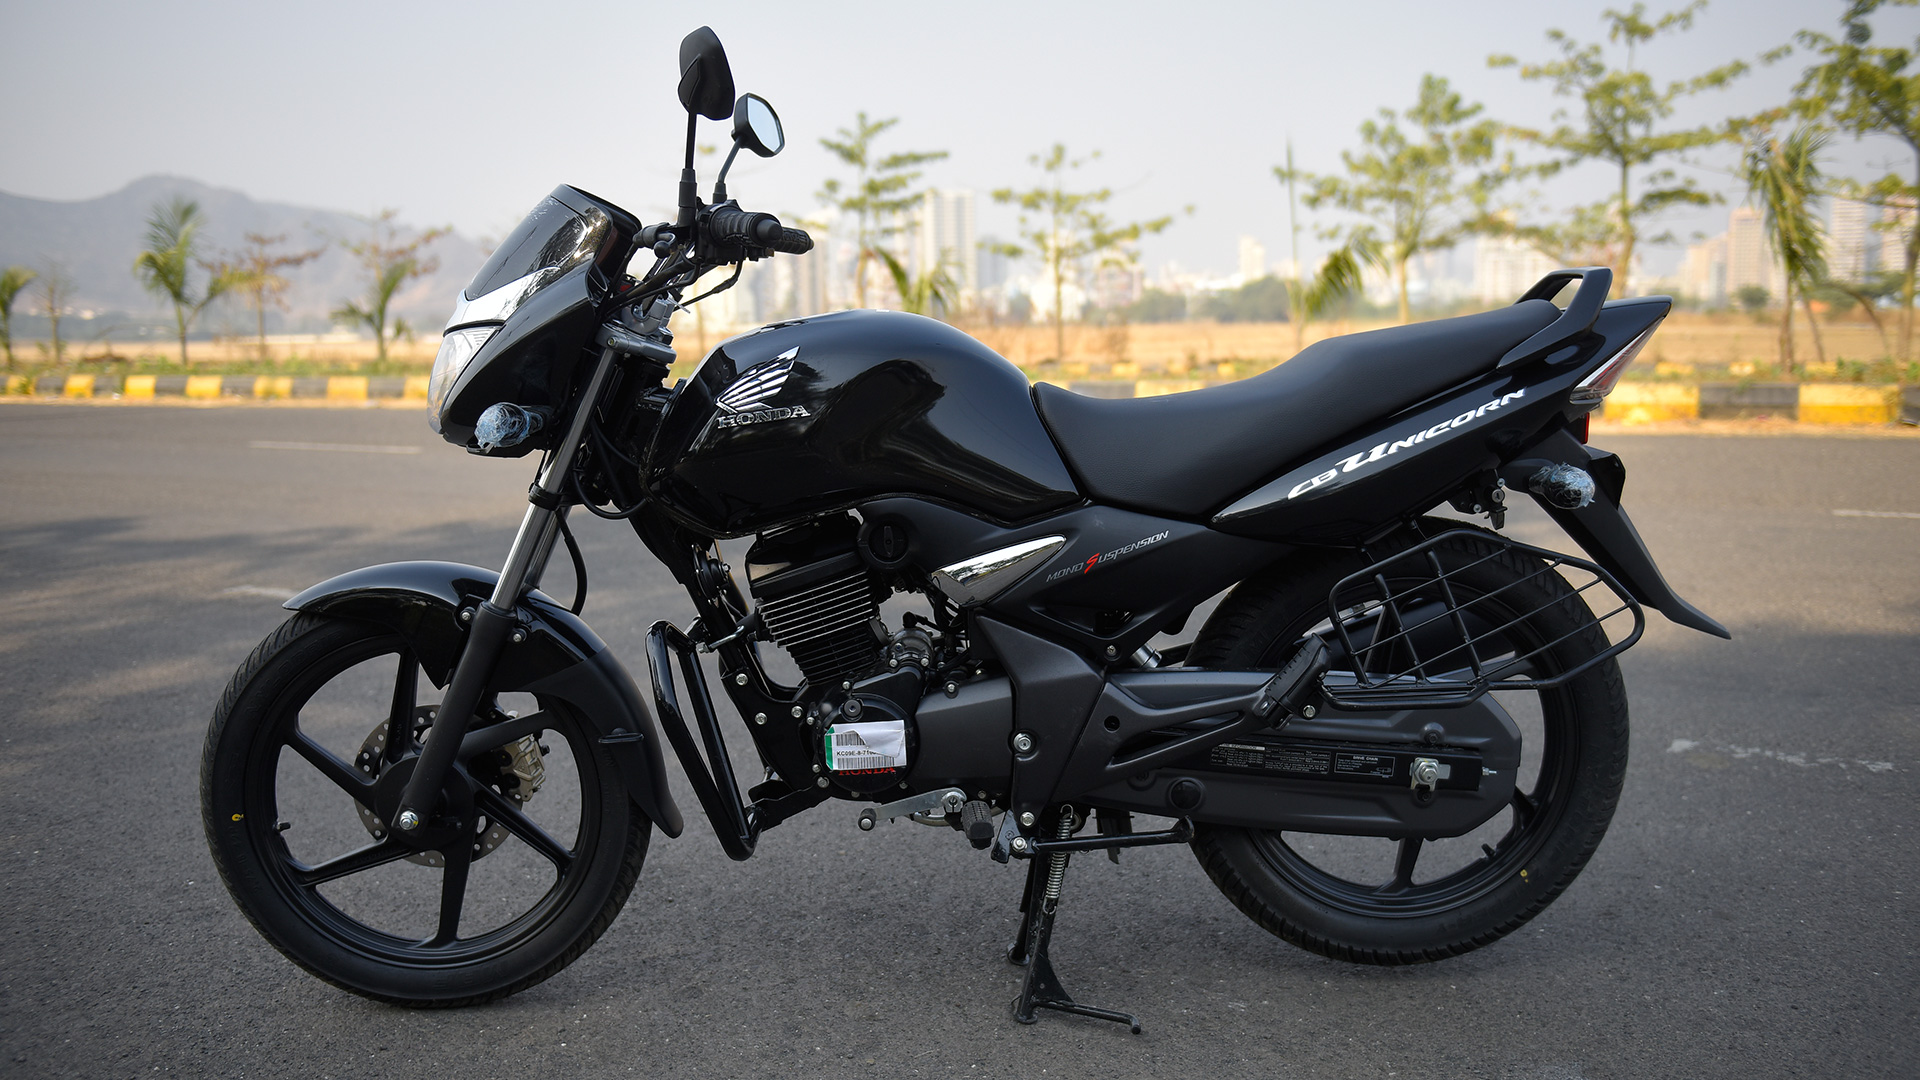 Honda Cb Unicorn 150 2016 Std   Unicorn 150 Black Color 1920x1080